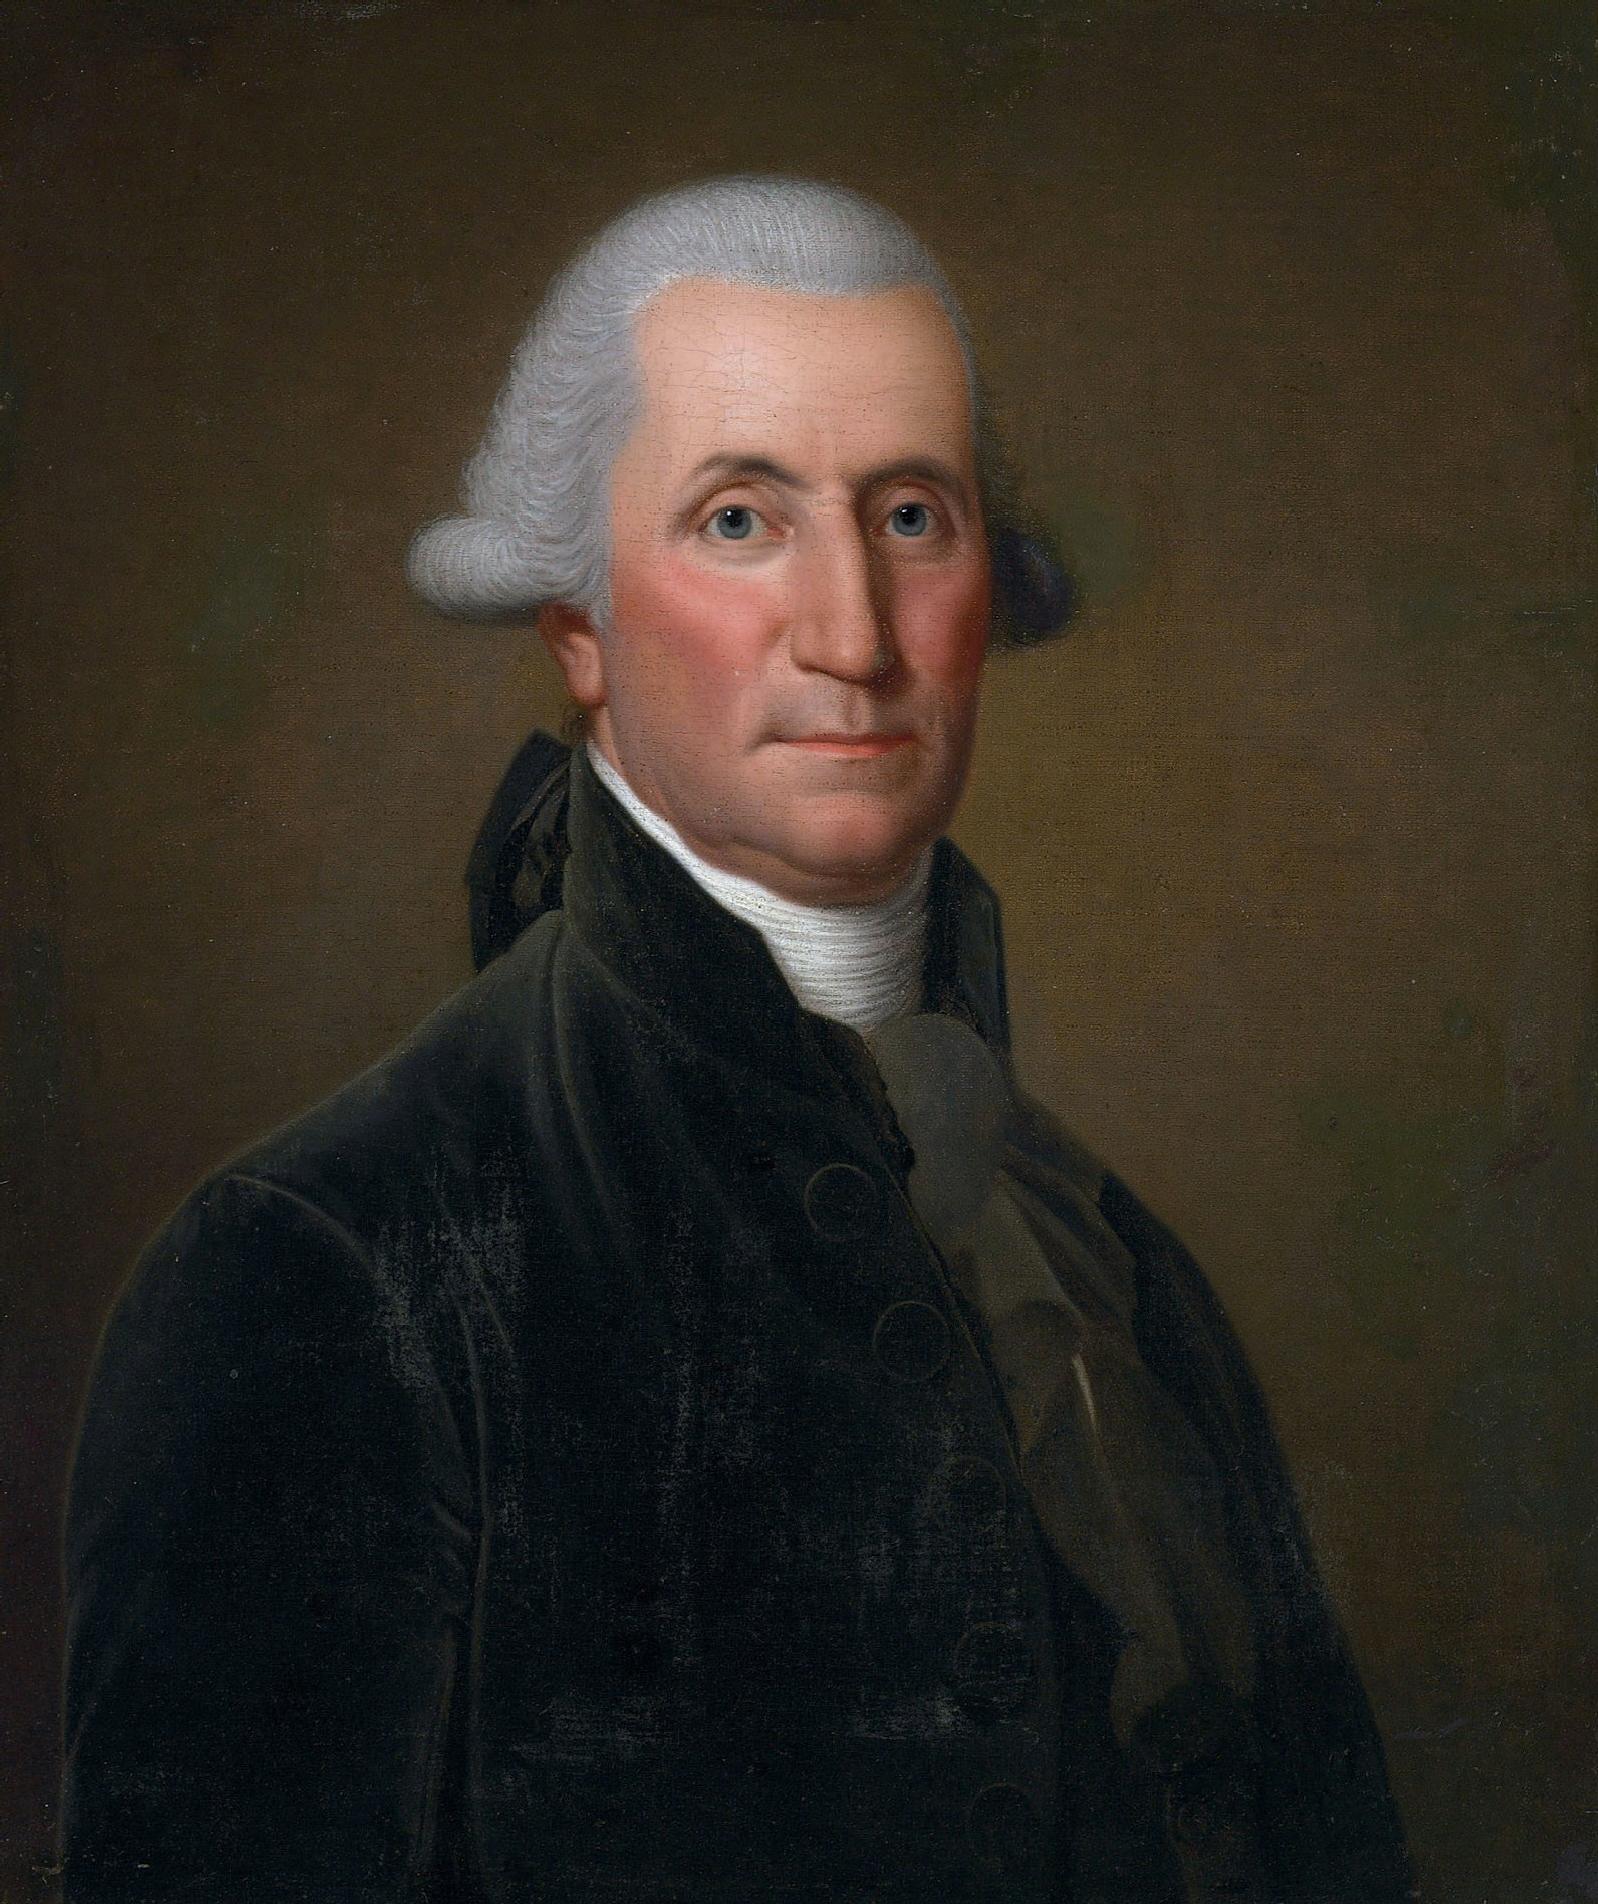 File:George Washington by Adolf Ulrik Wertmuller.jpg ...